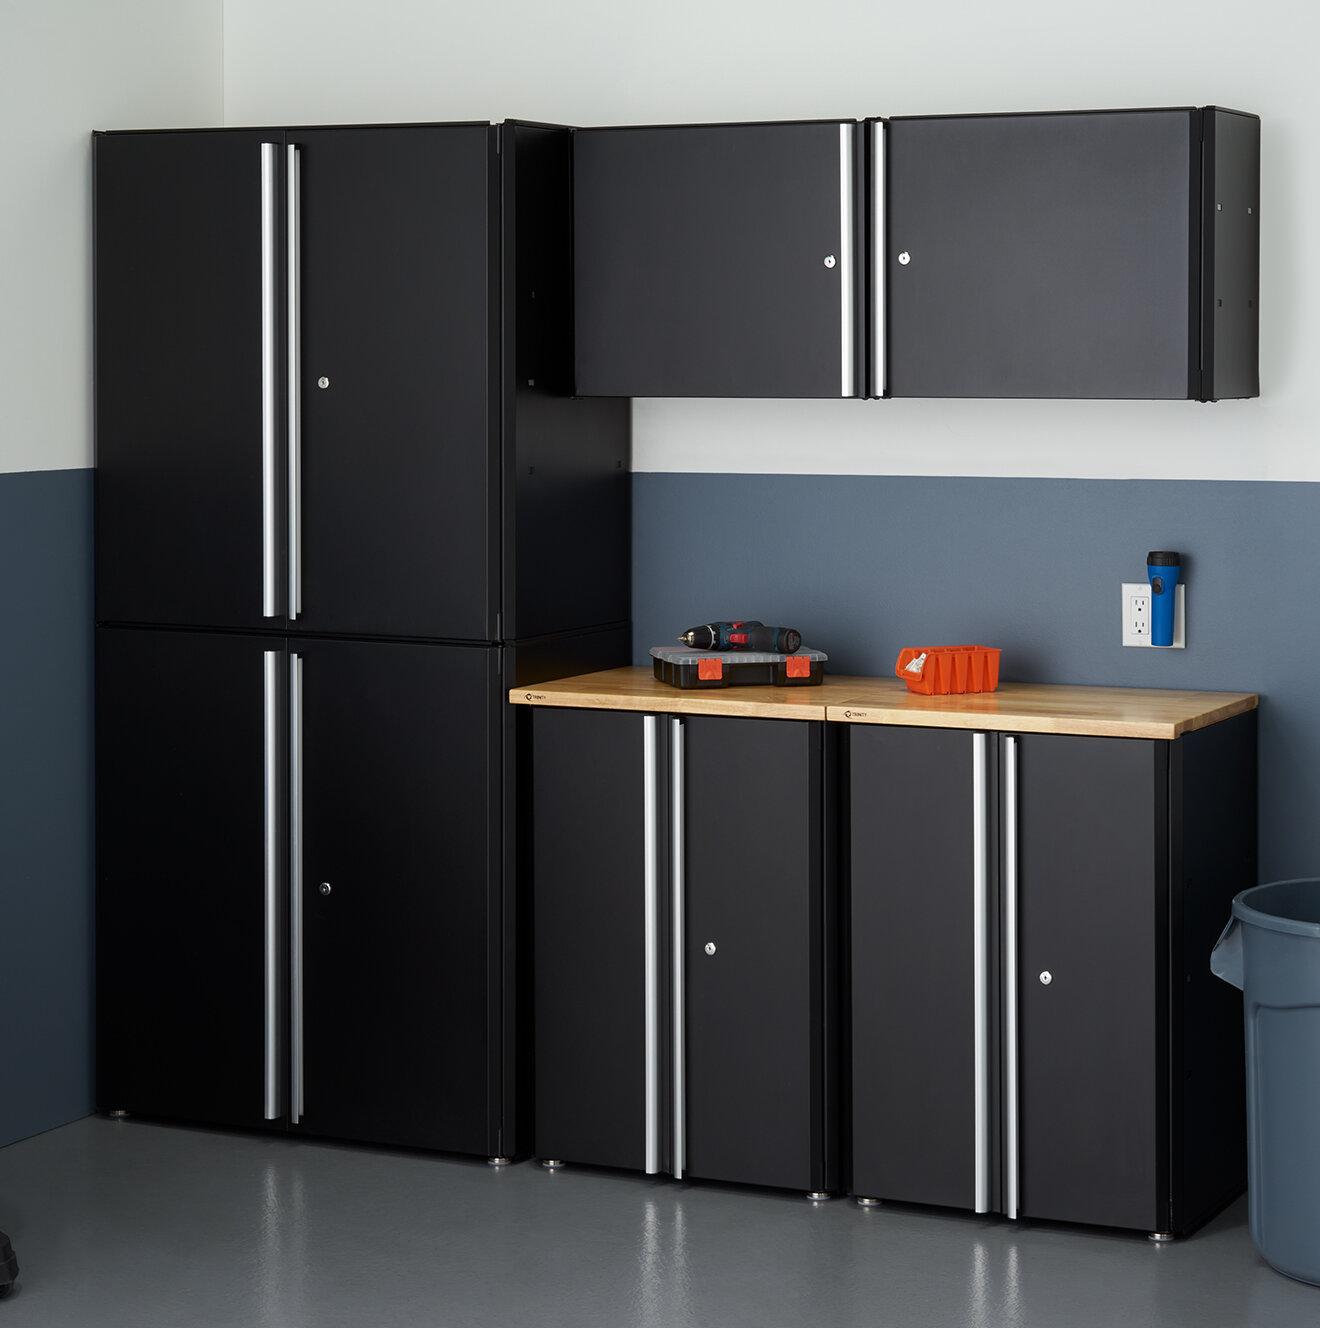 Locking Storage Cabinets You Ll Love In 2021 Wayfair